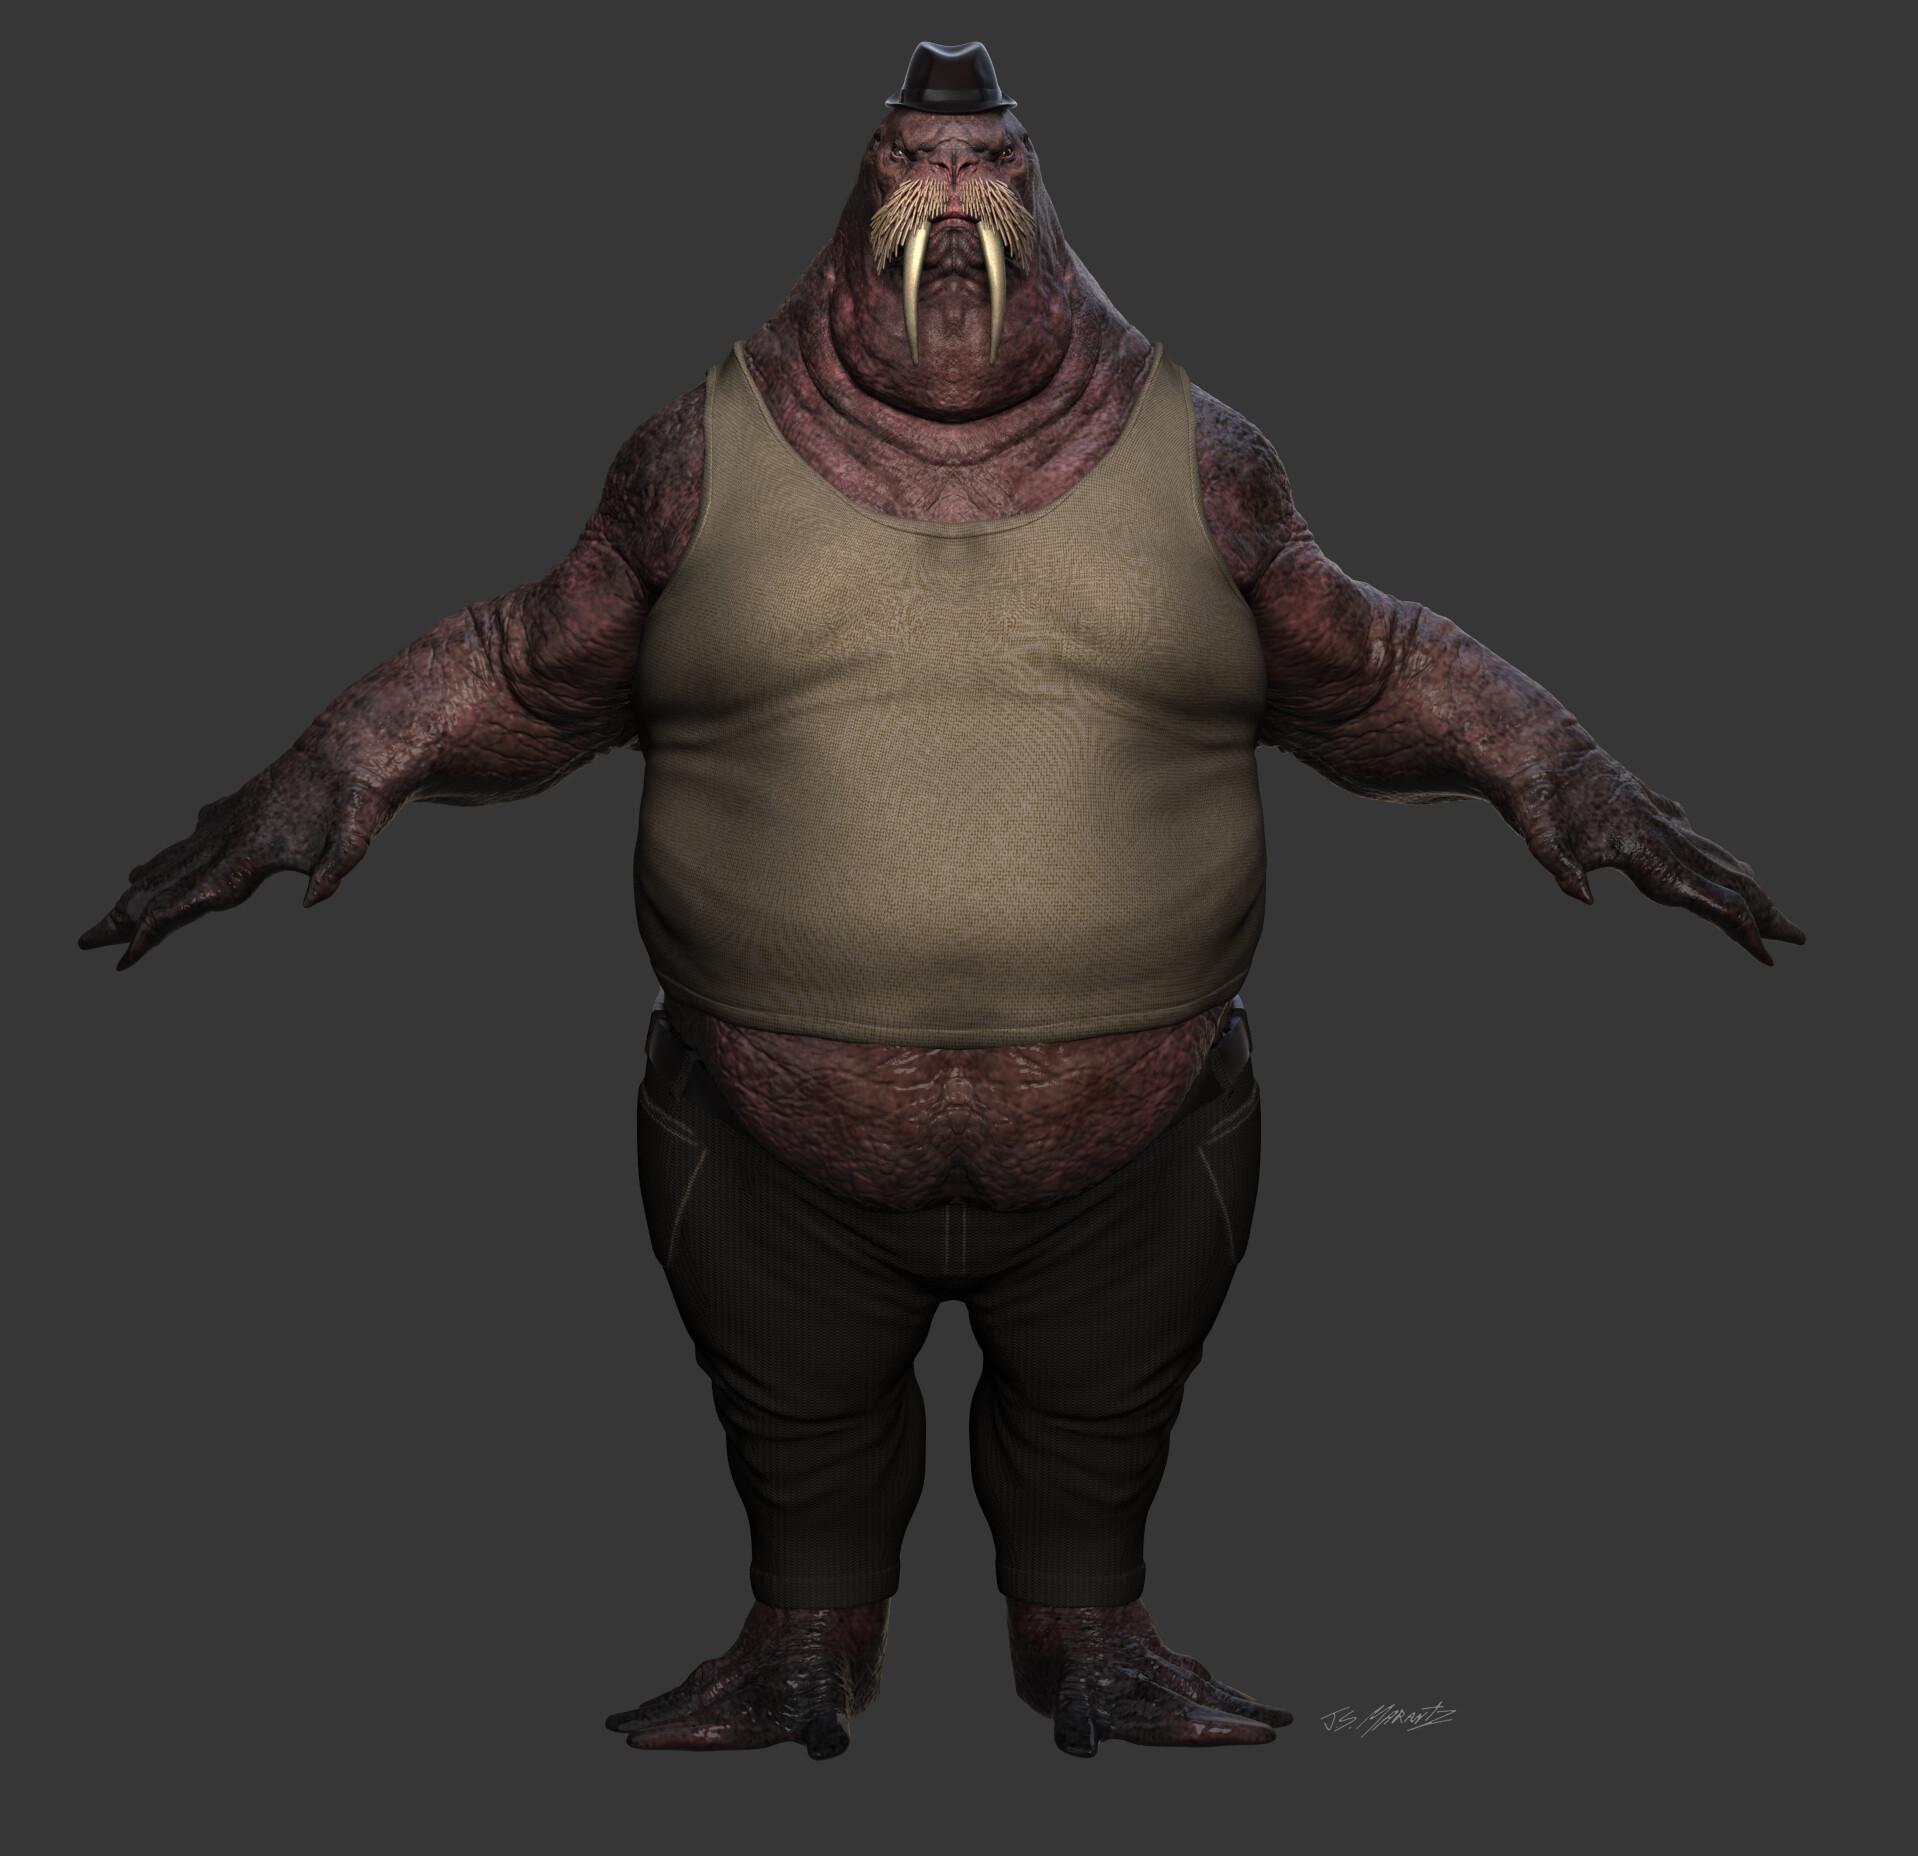 jerx-marantz-walrus-wip-2.jpg